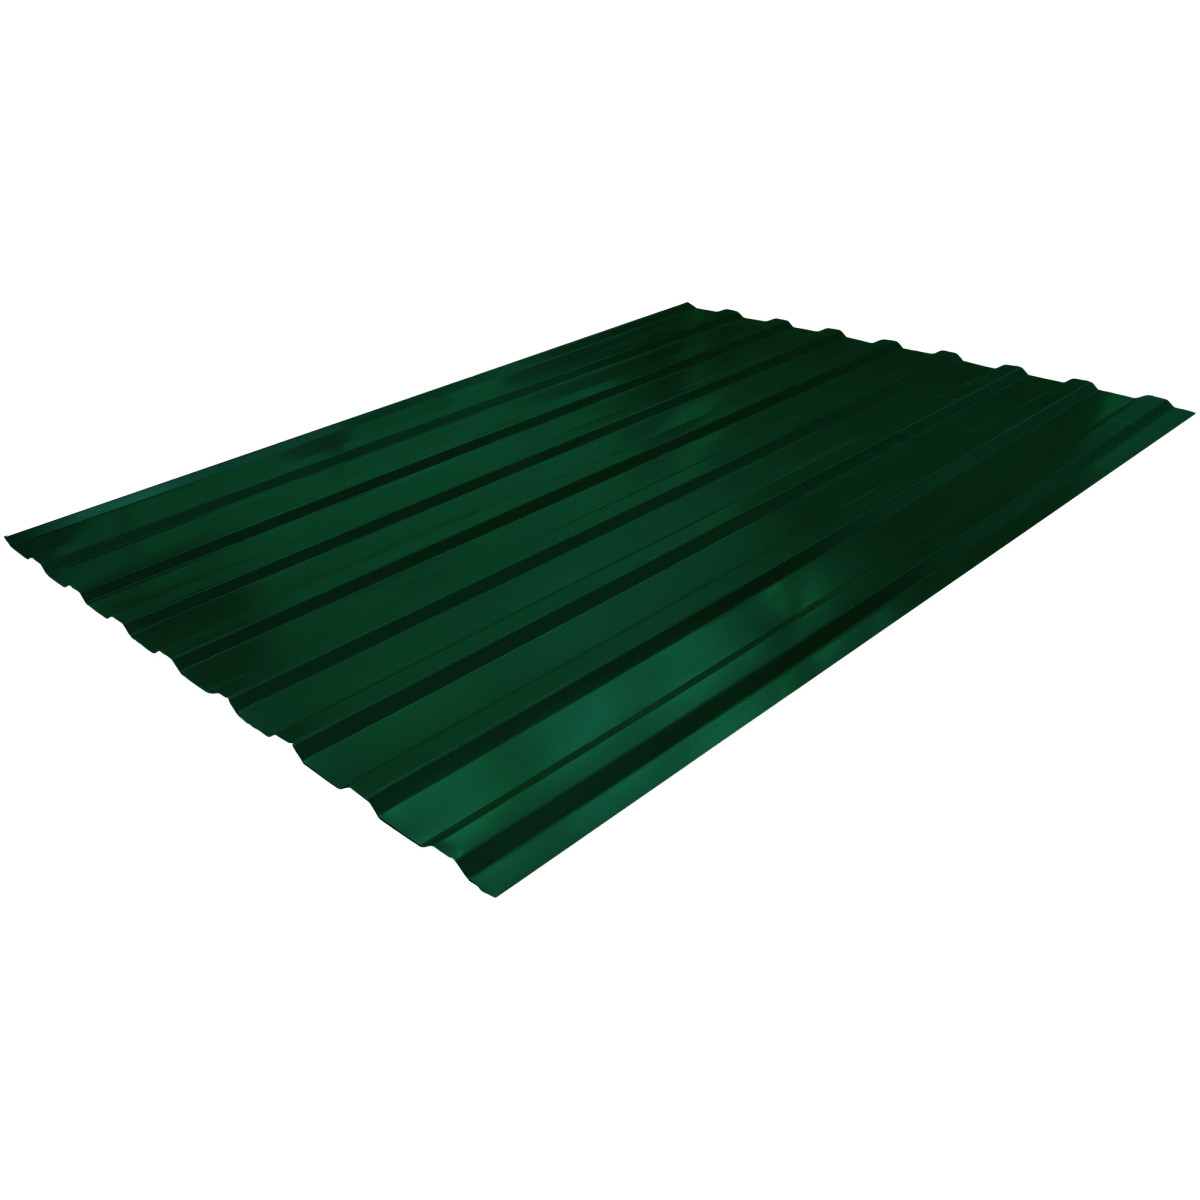 Профнастил С20 зеленый 1.15х2 м 0.3 мм